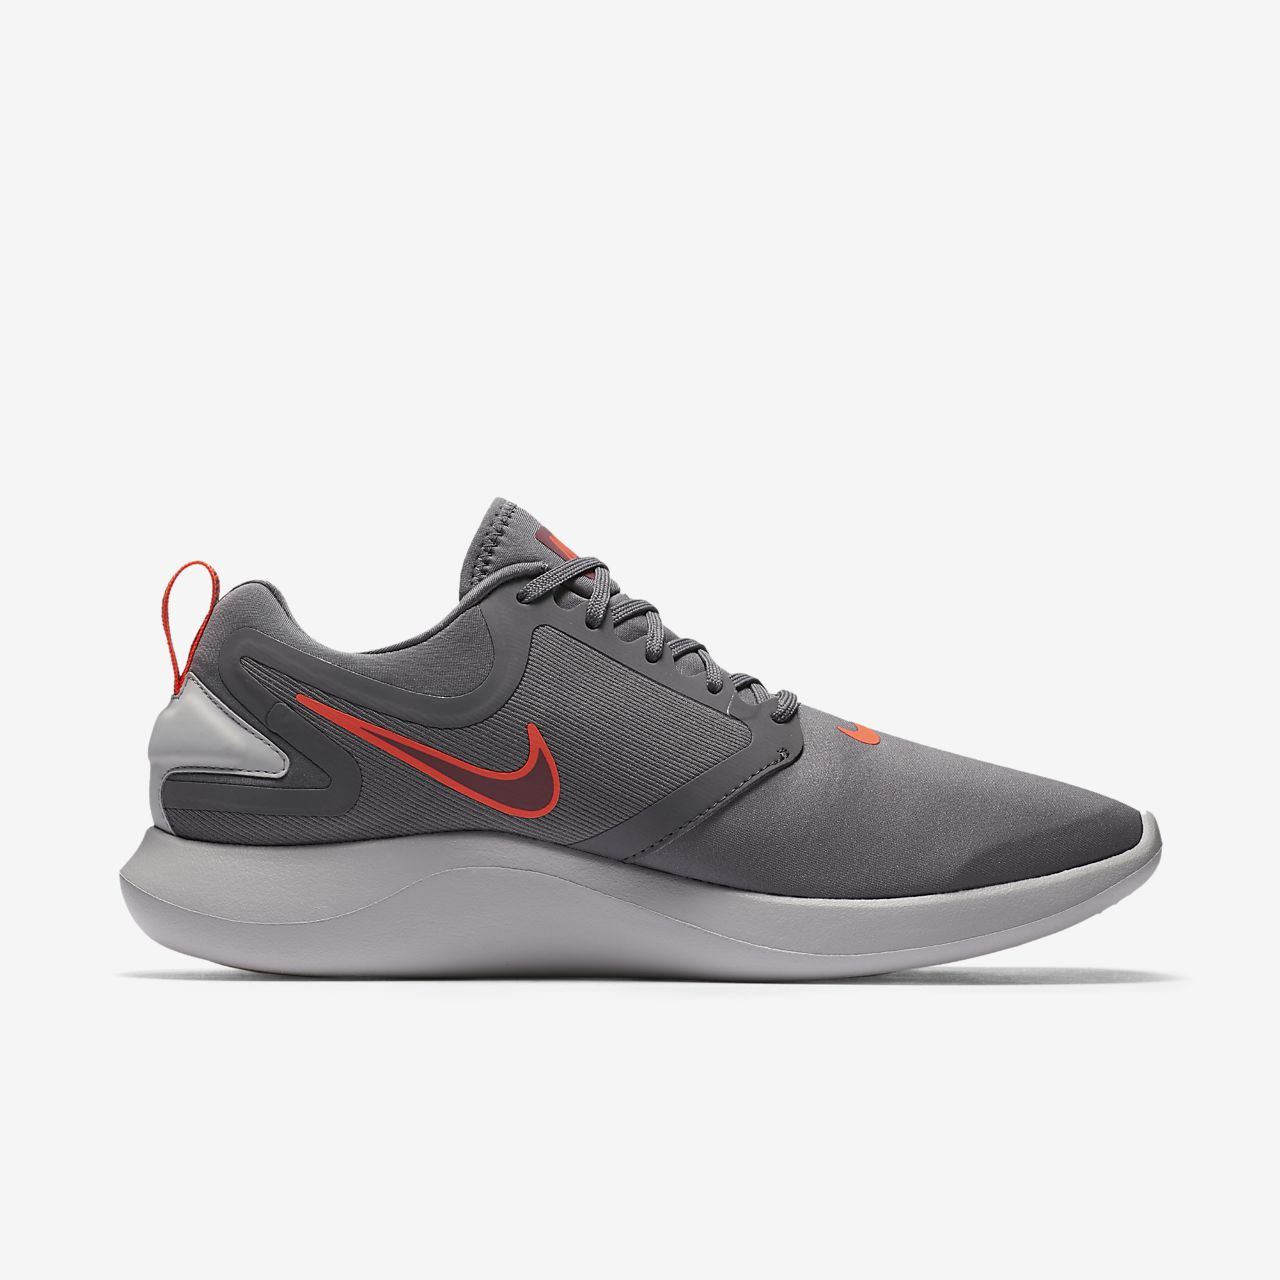 buy nike shoes online australia application for permanent 845919